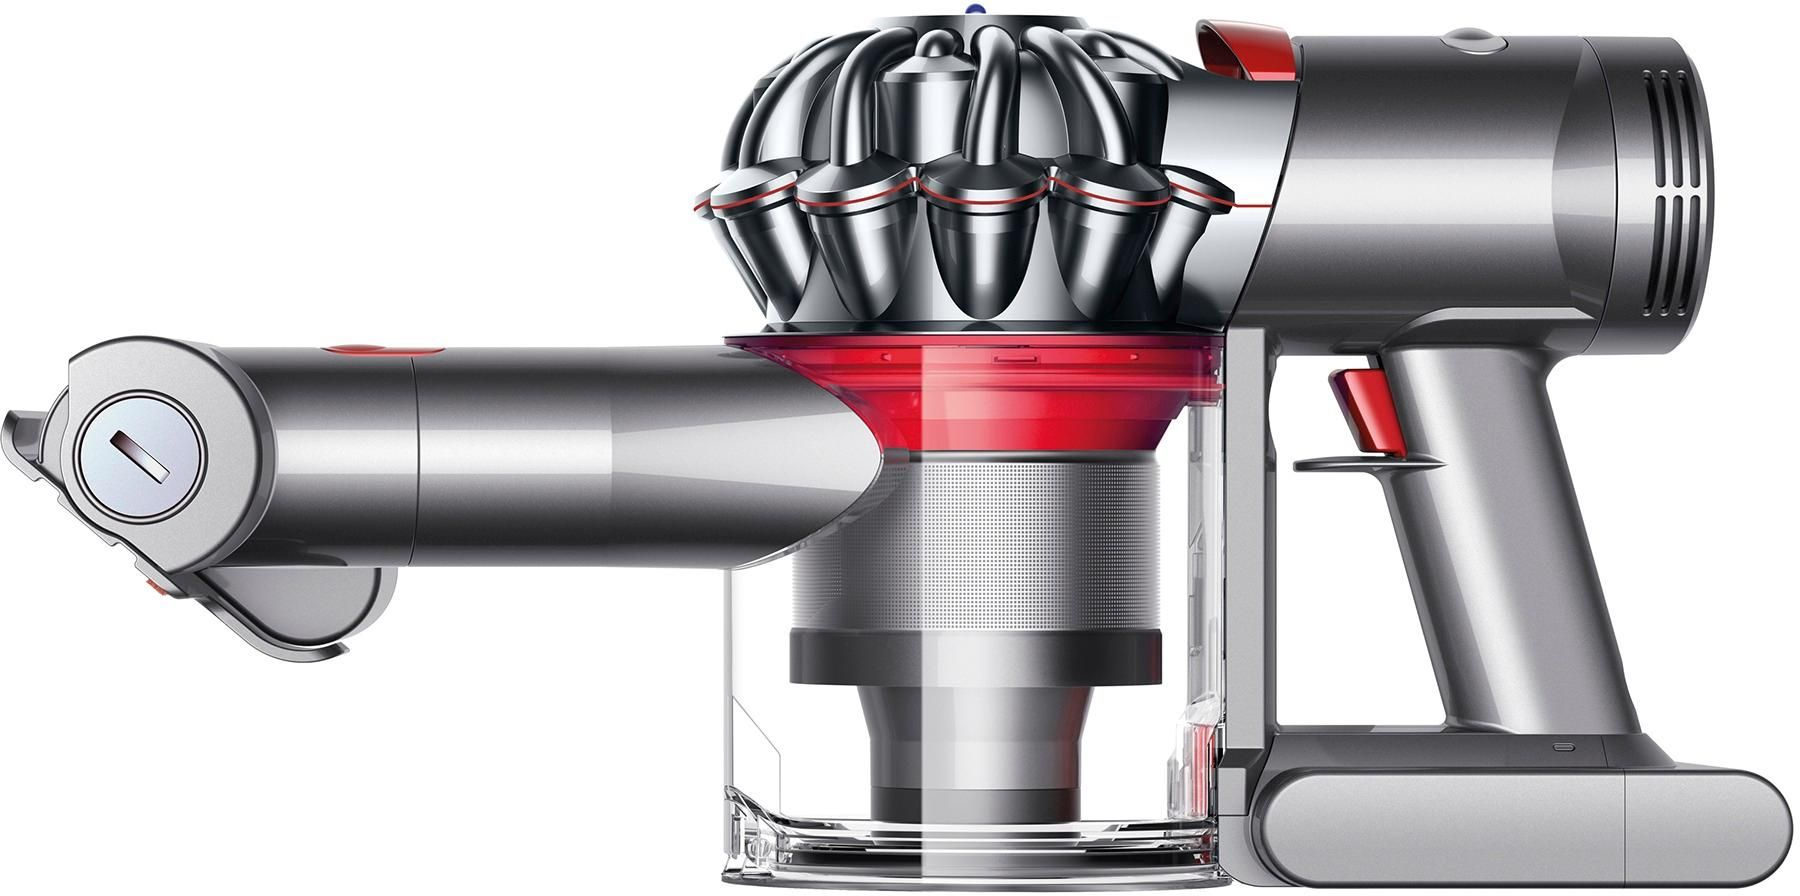 Dyson V7 Trigger Cordless Hand Vac Iron Nickel 231770 01 Best Buy Dyson Handheld Vacuum Cordless Vacuum Cleaner Handheld Vacuum